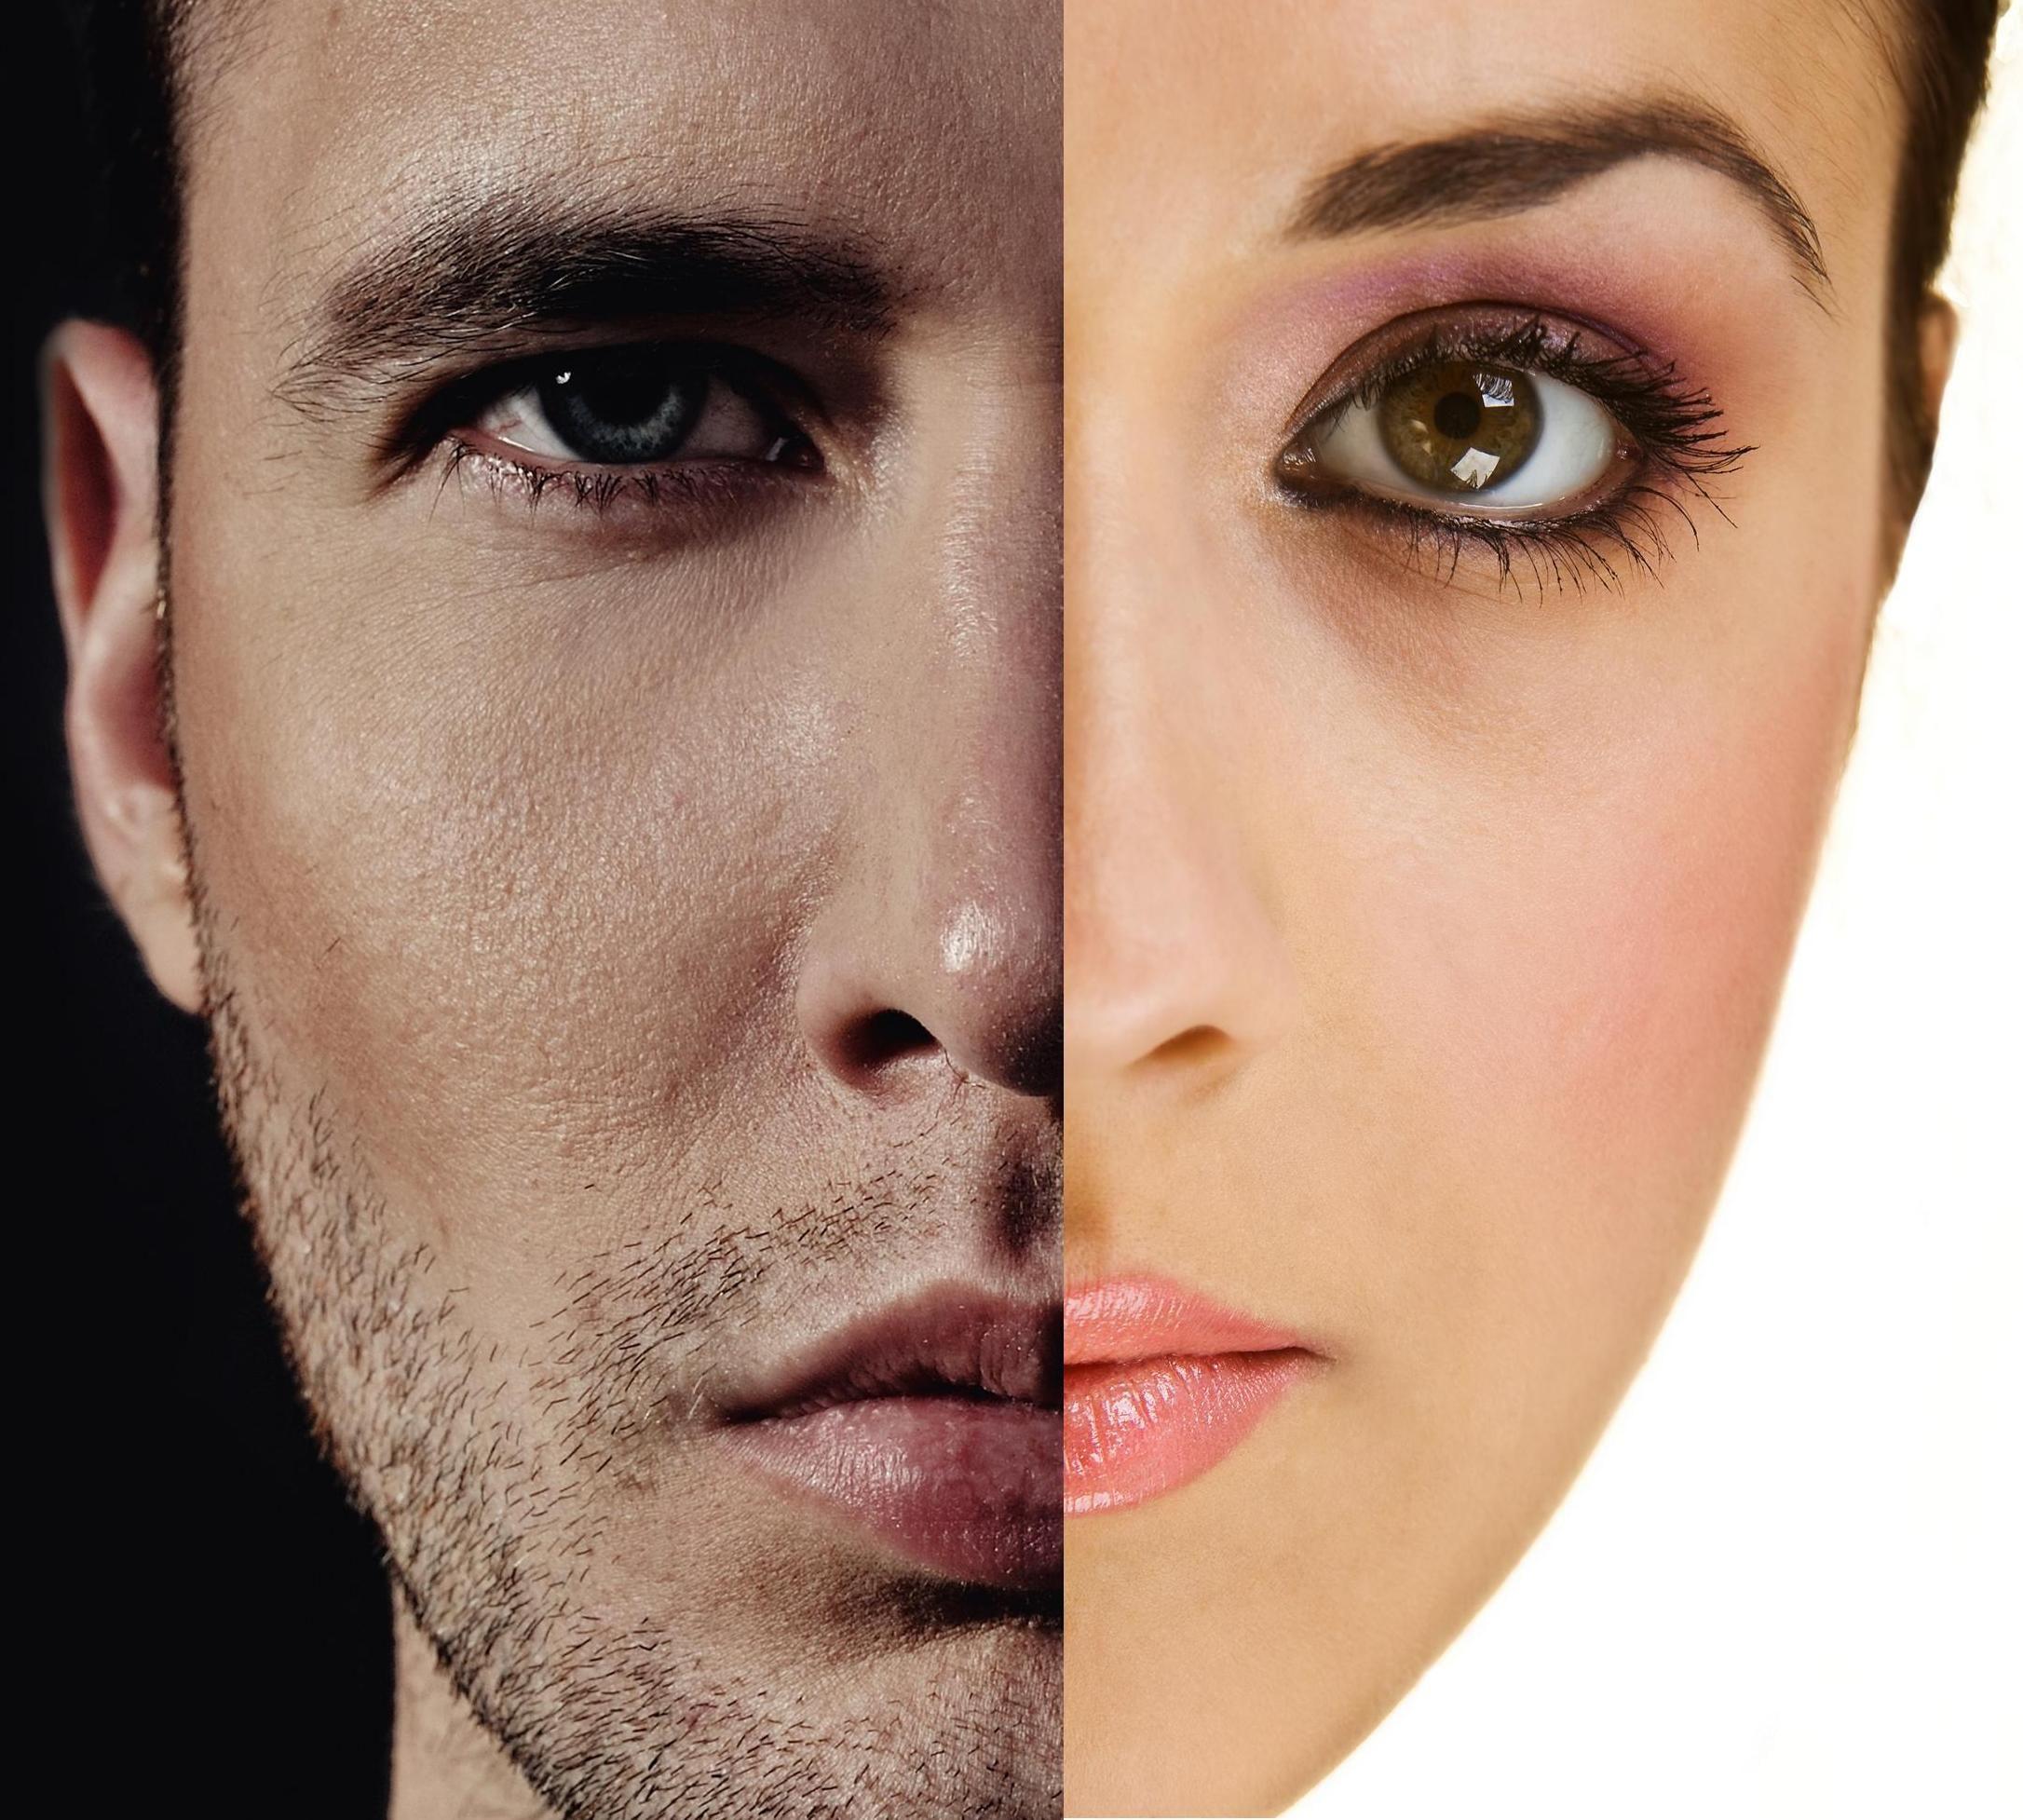 Male Vs Female Eyes And Brows  Eyes  Pinterest  Eyebrow-9036